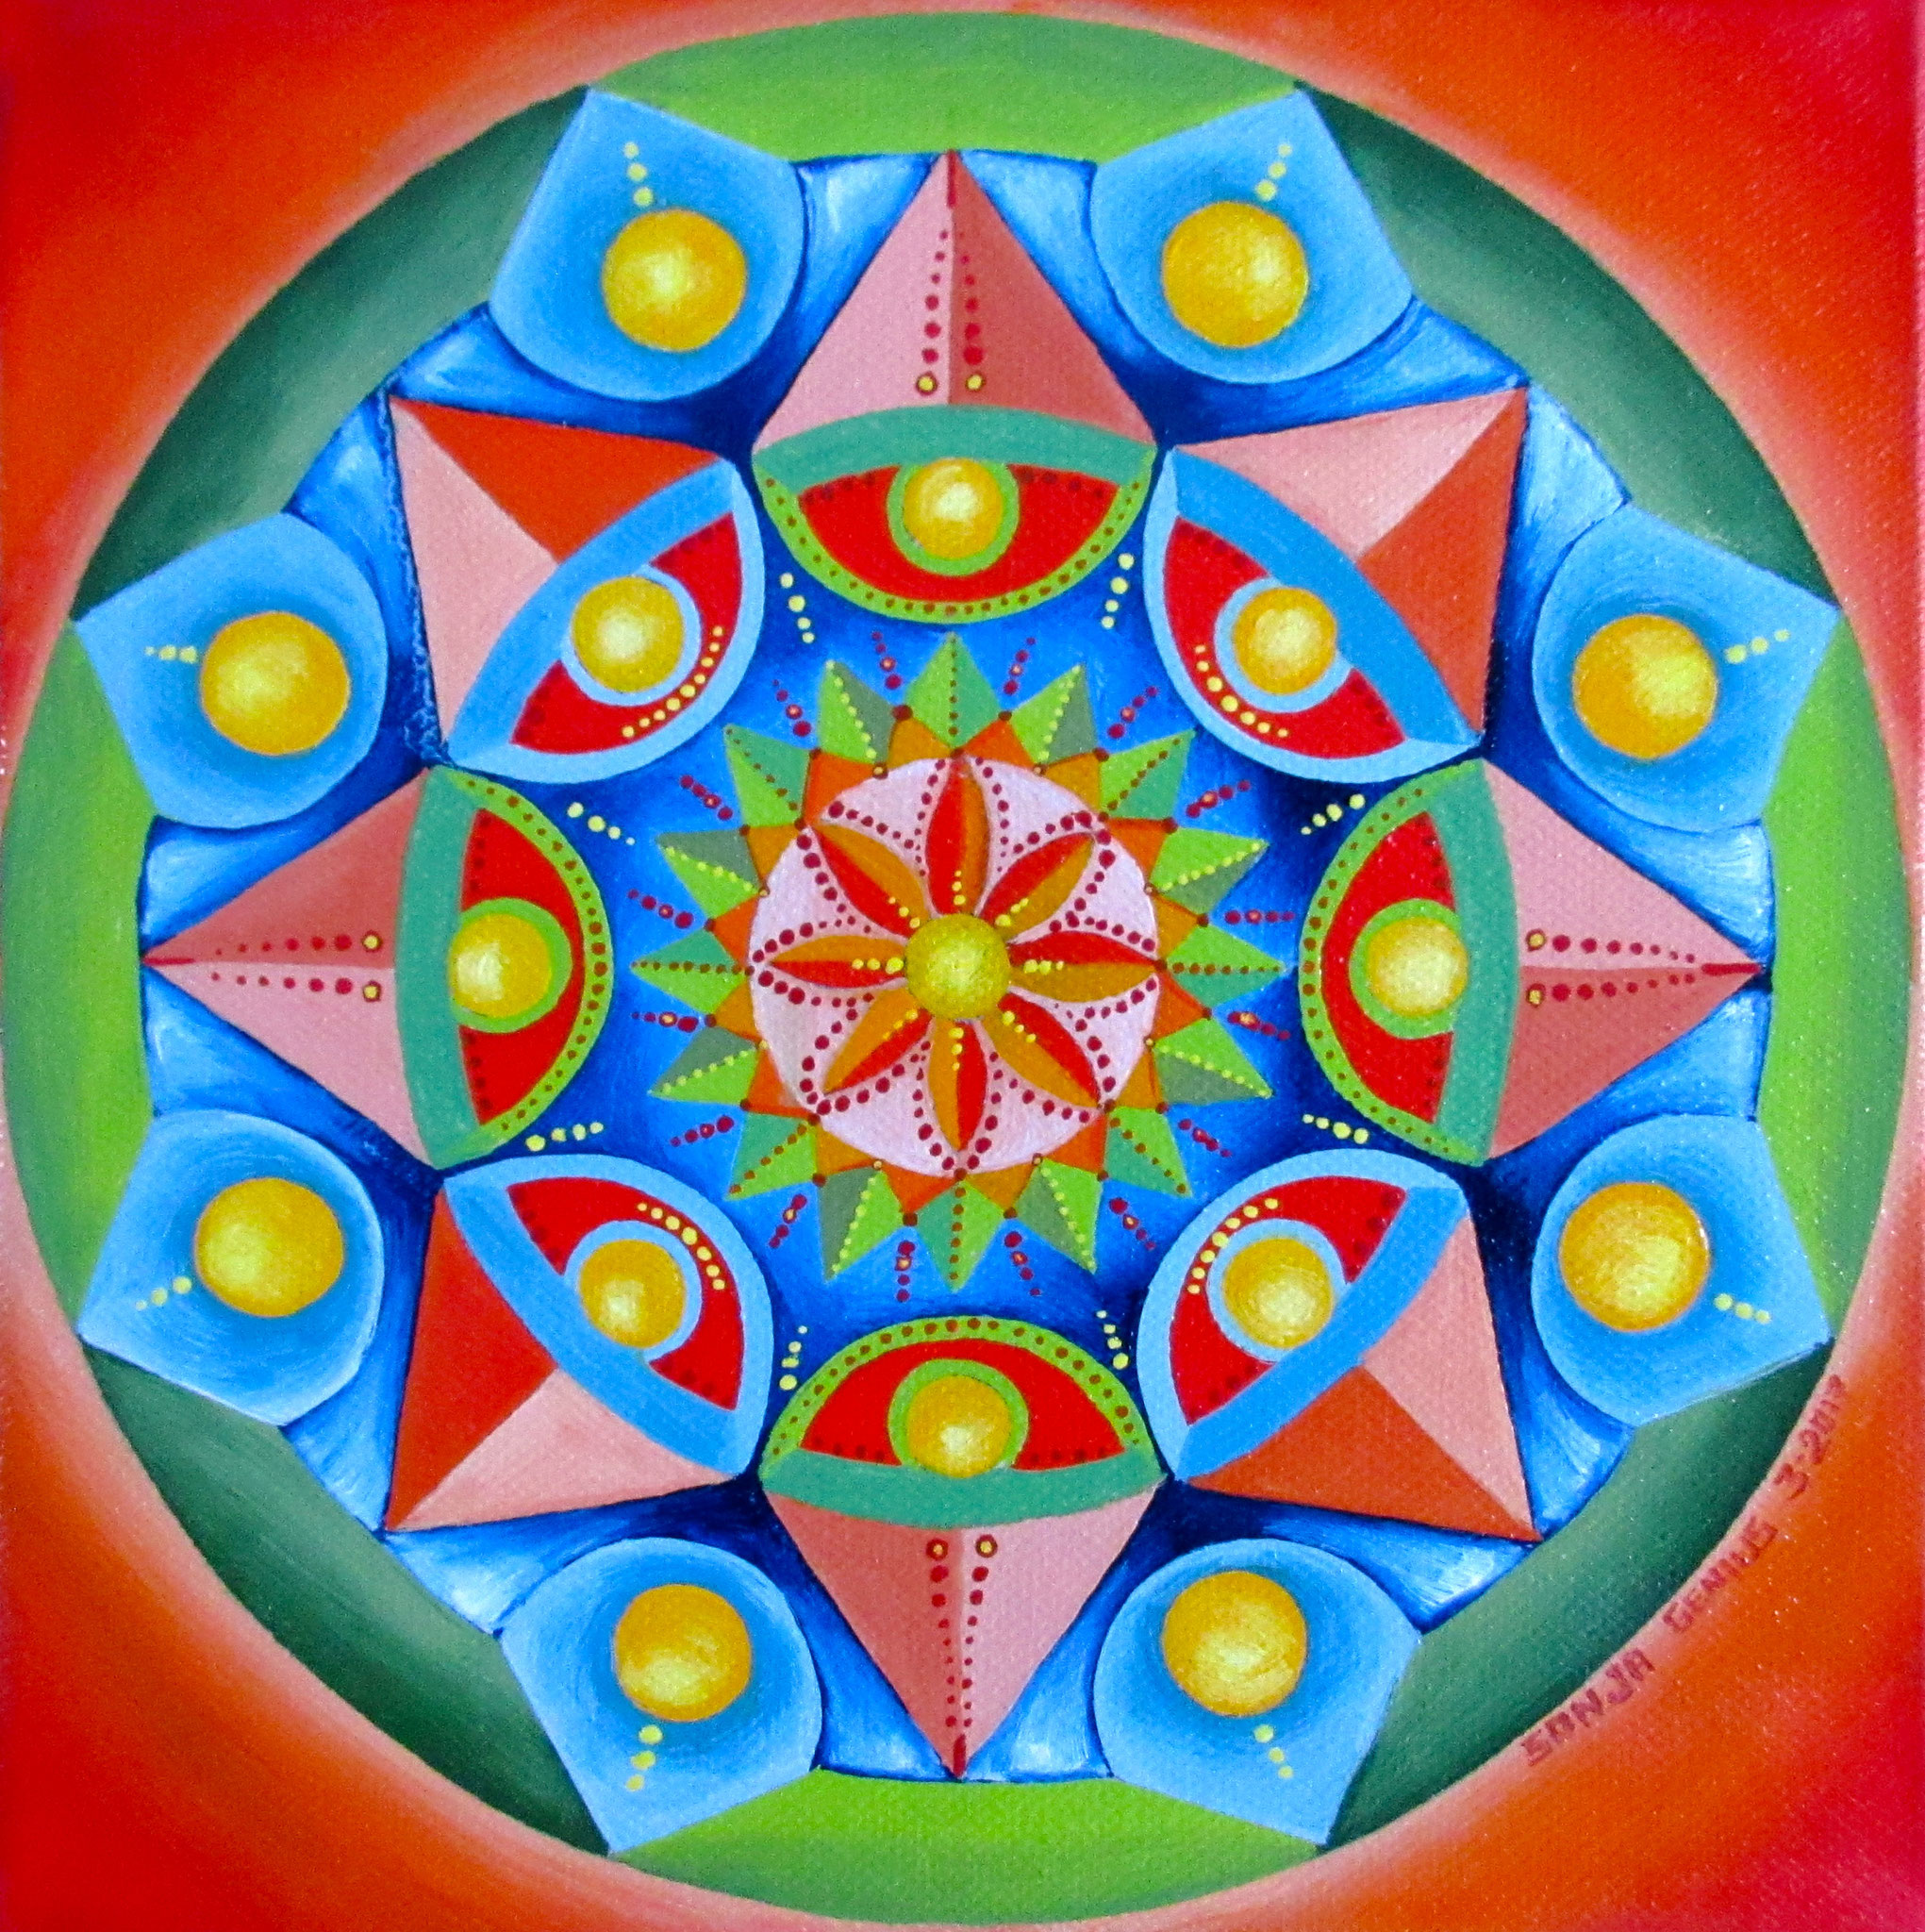 Hex Mandala I, oil on canvas 8x8, March 2017 (-1)